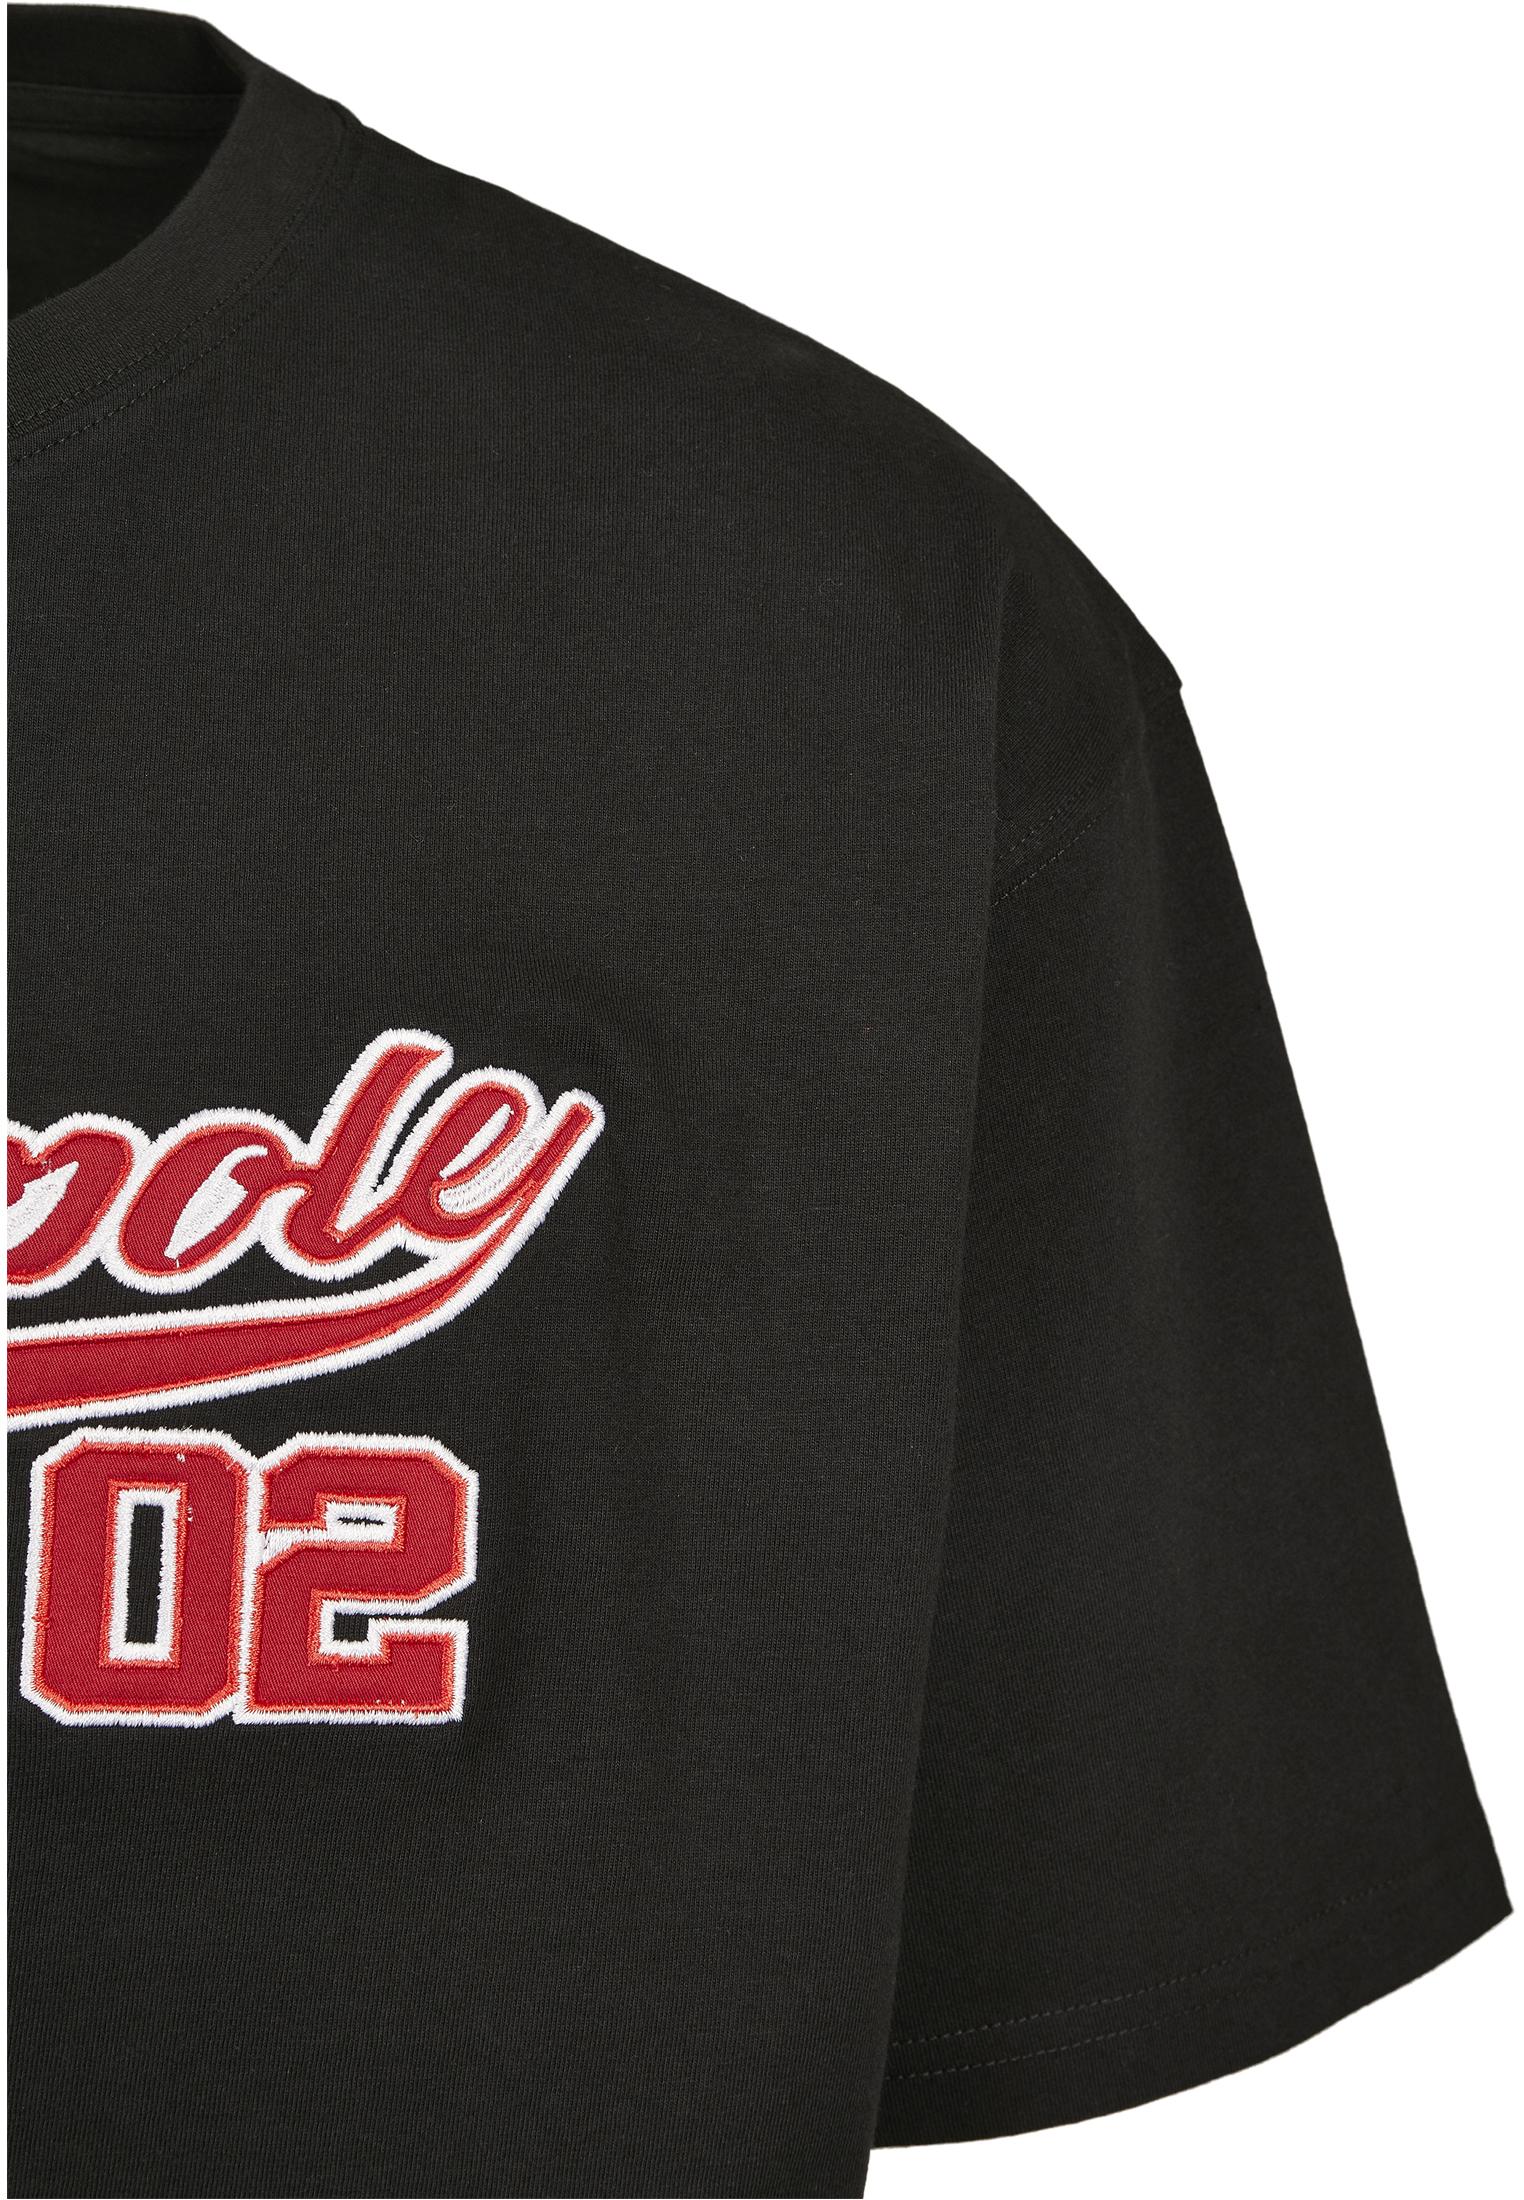 Southpole T-Shirt Written Logo Tee SP009 Black